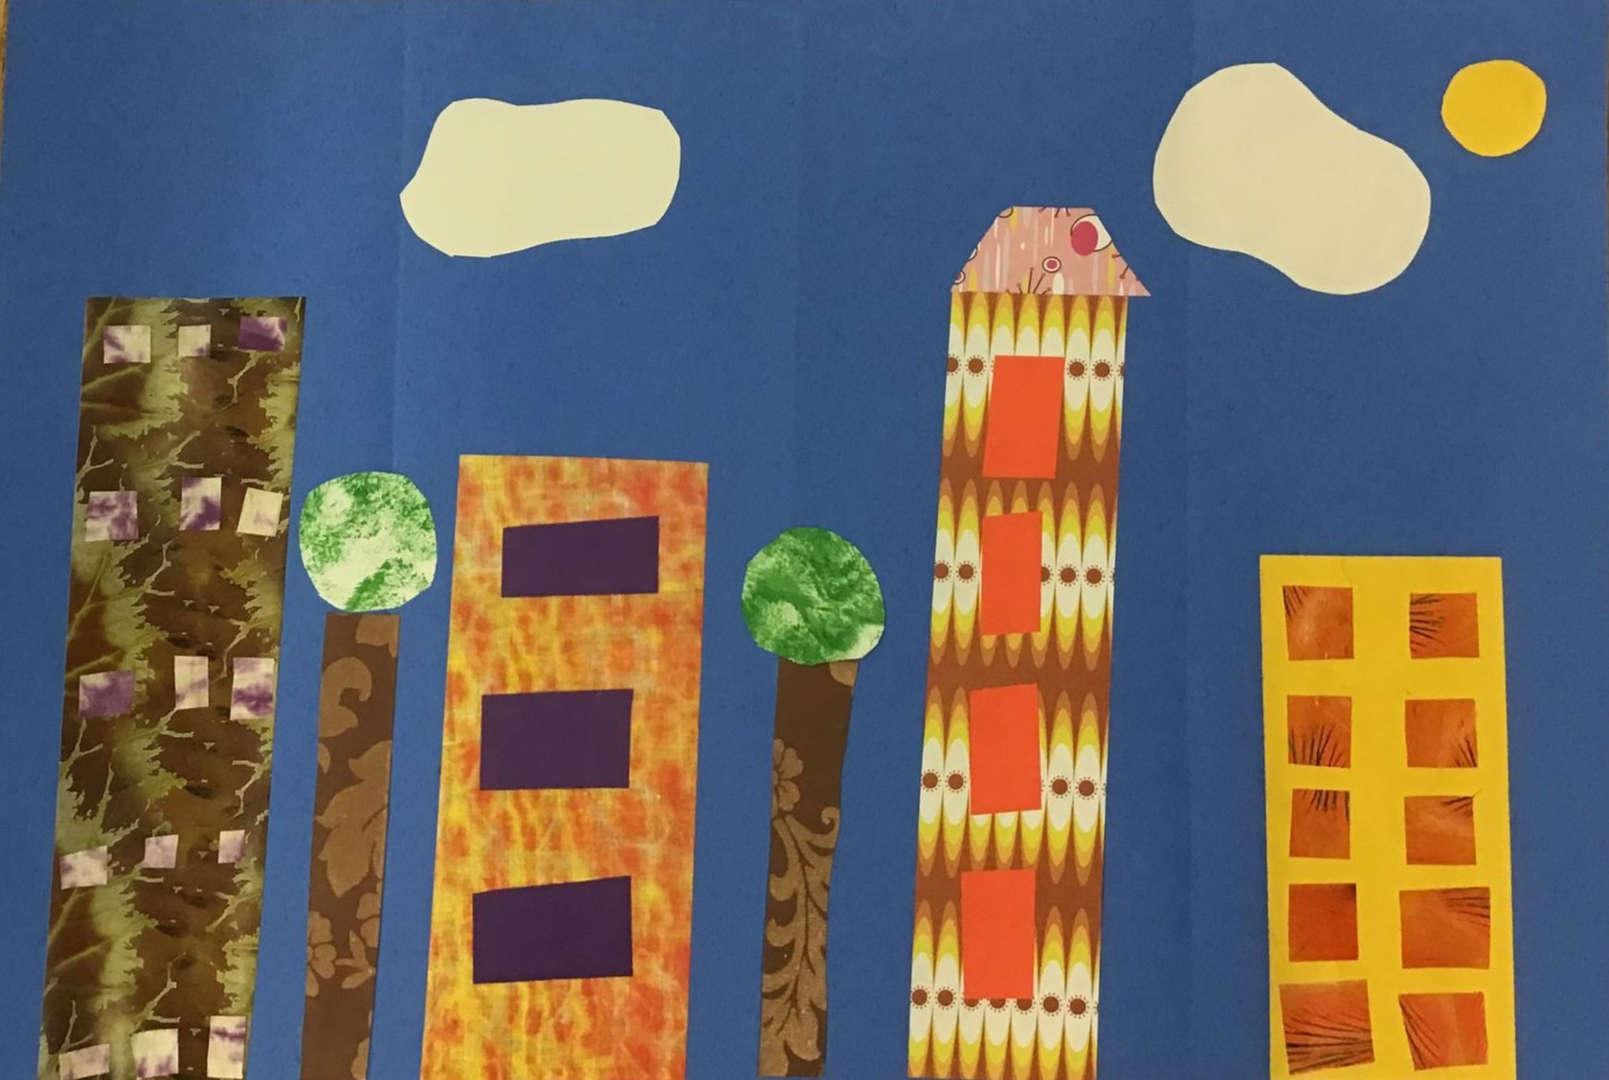 Building city scape collage